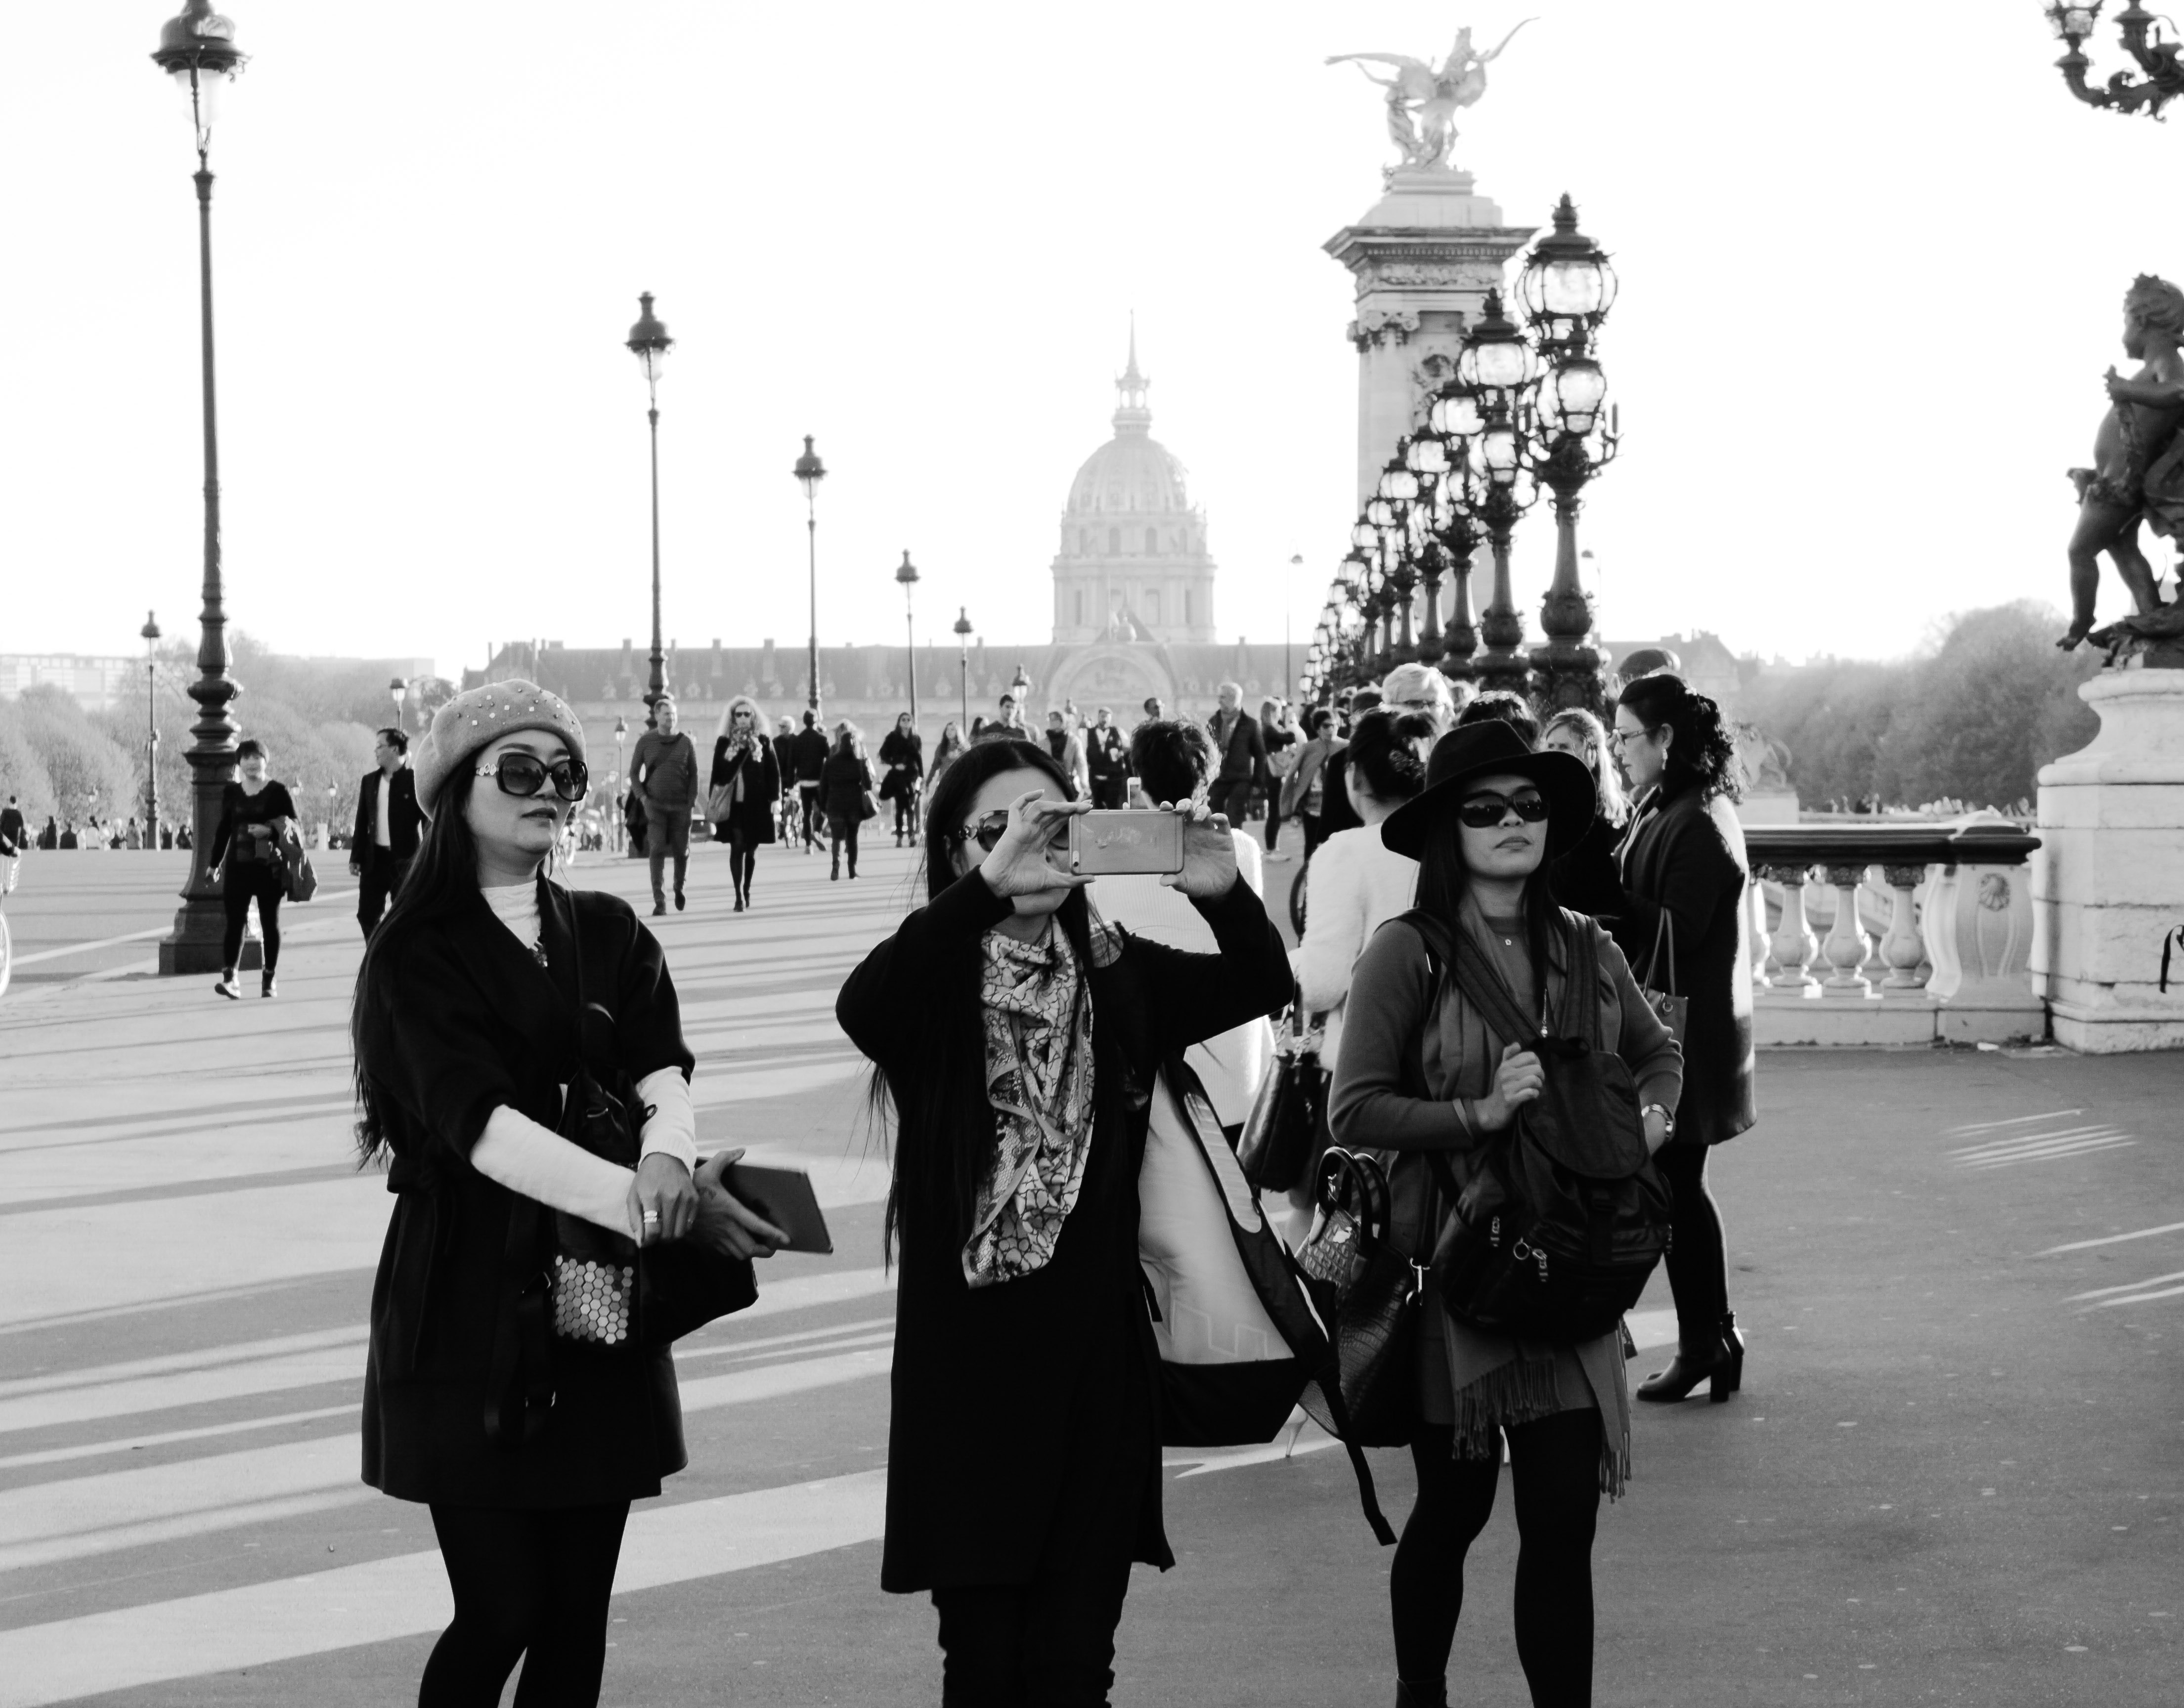 pont des invalides - 2015